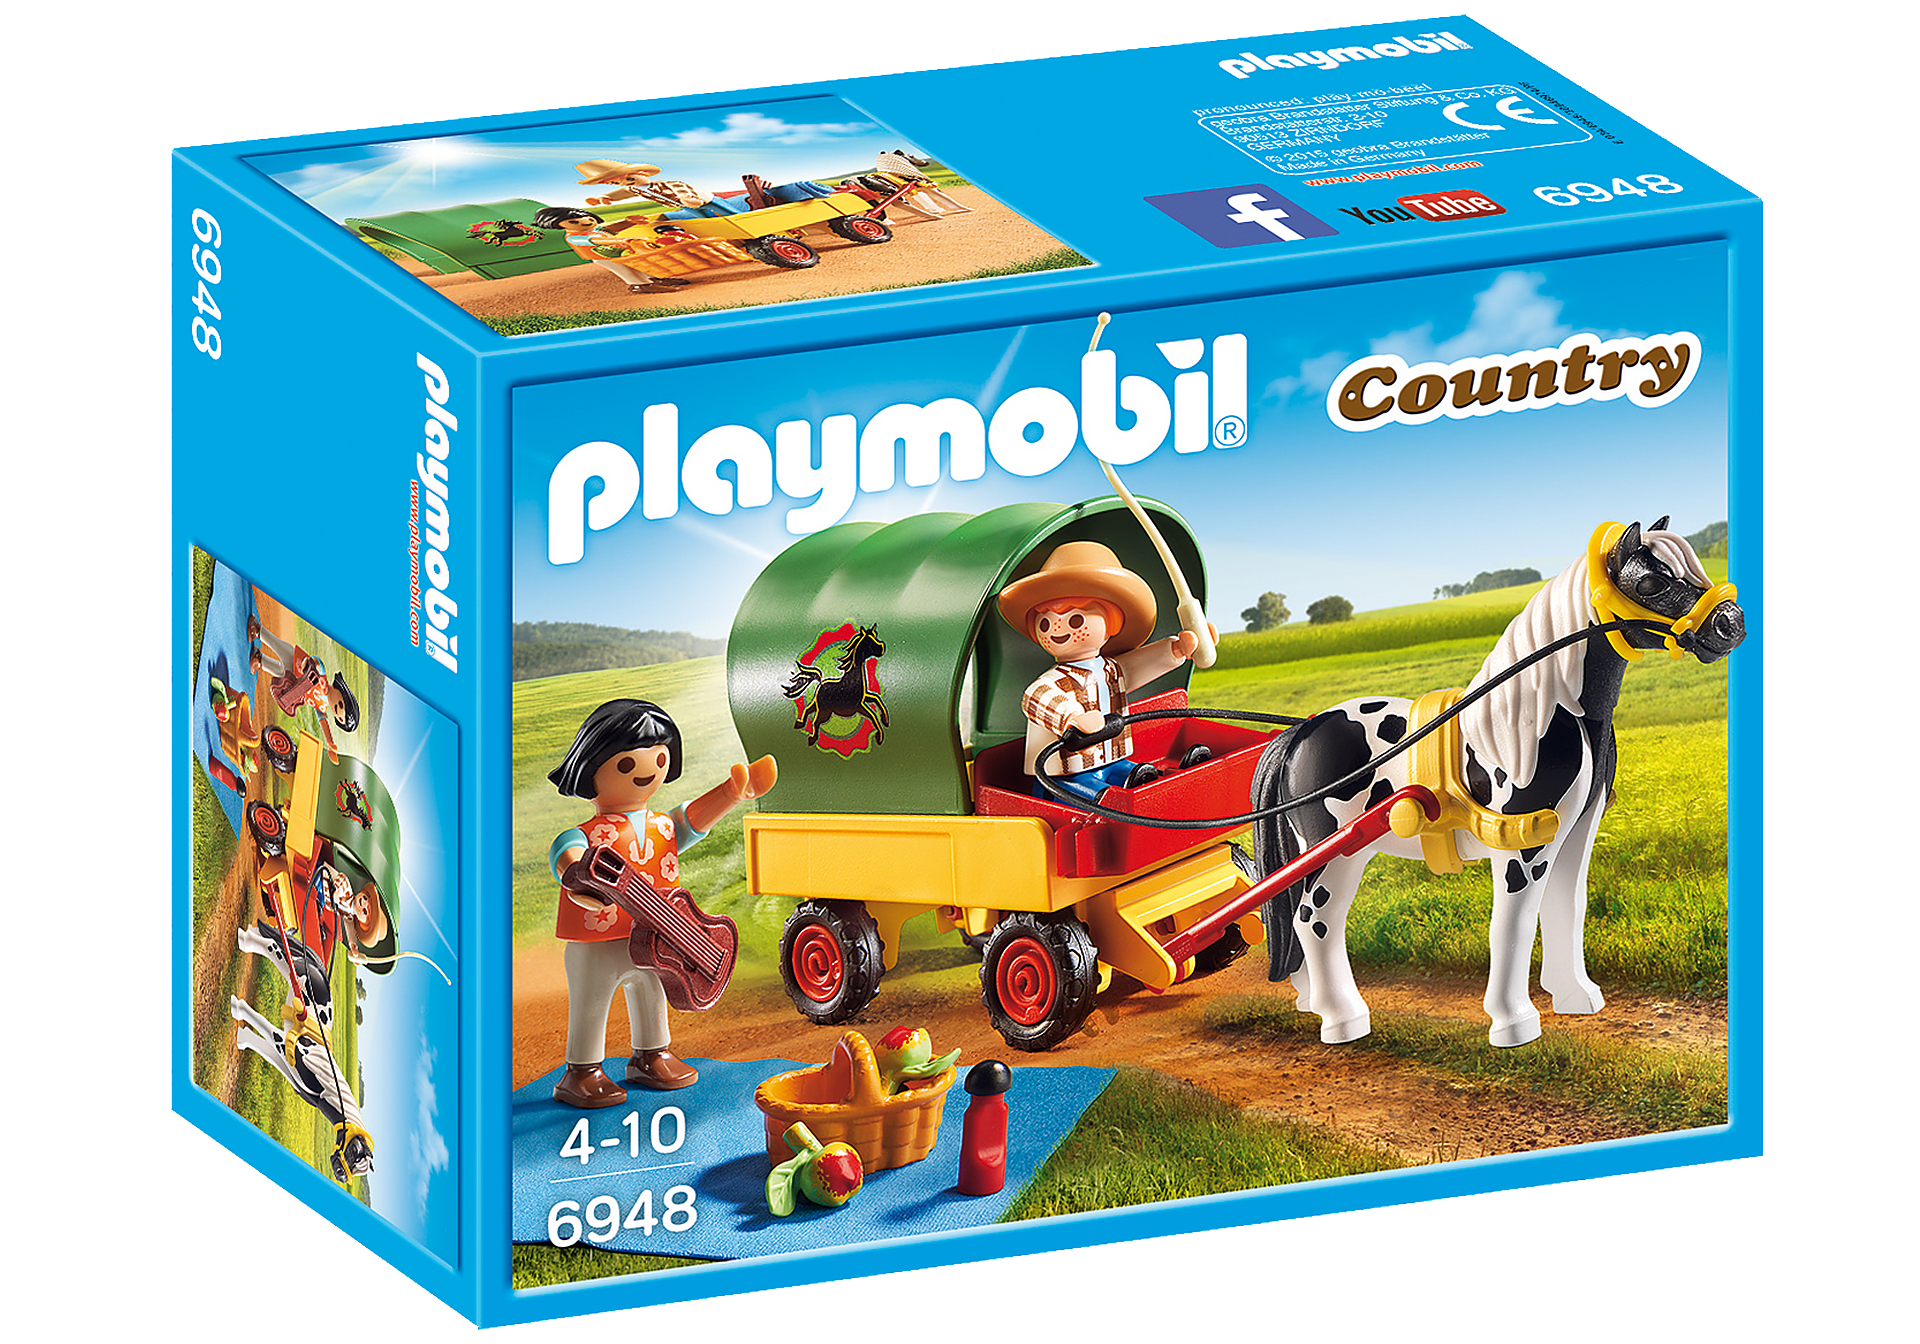 http://media.playmobil.com/i/playmobil/6948_product_box_front/Picknick met ponywagen